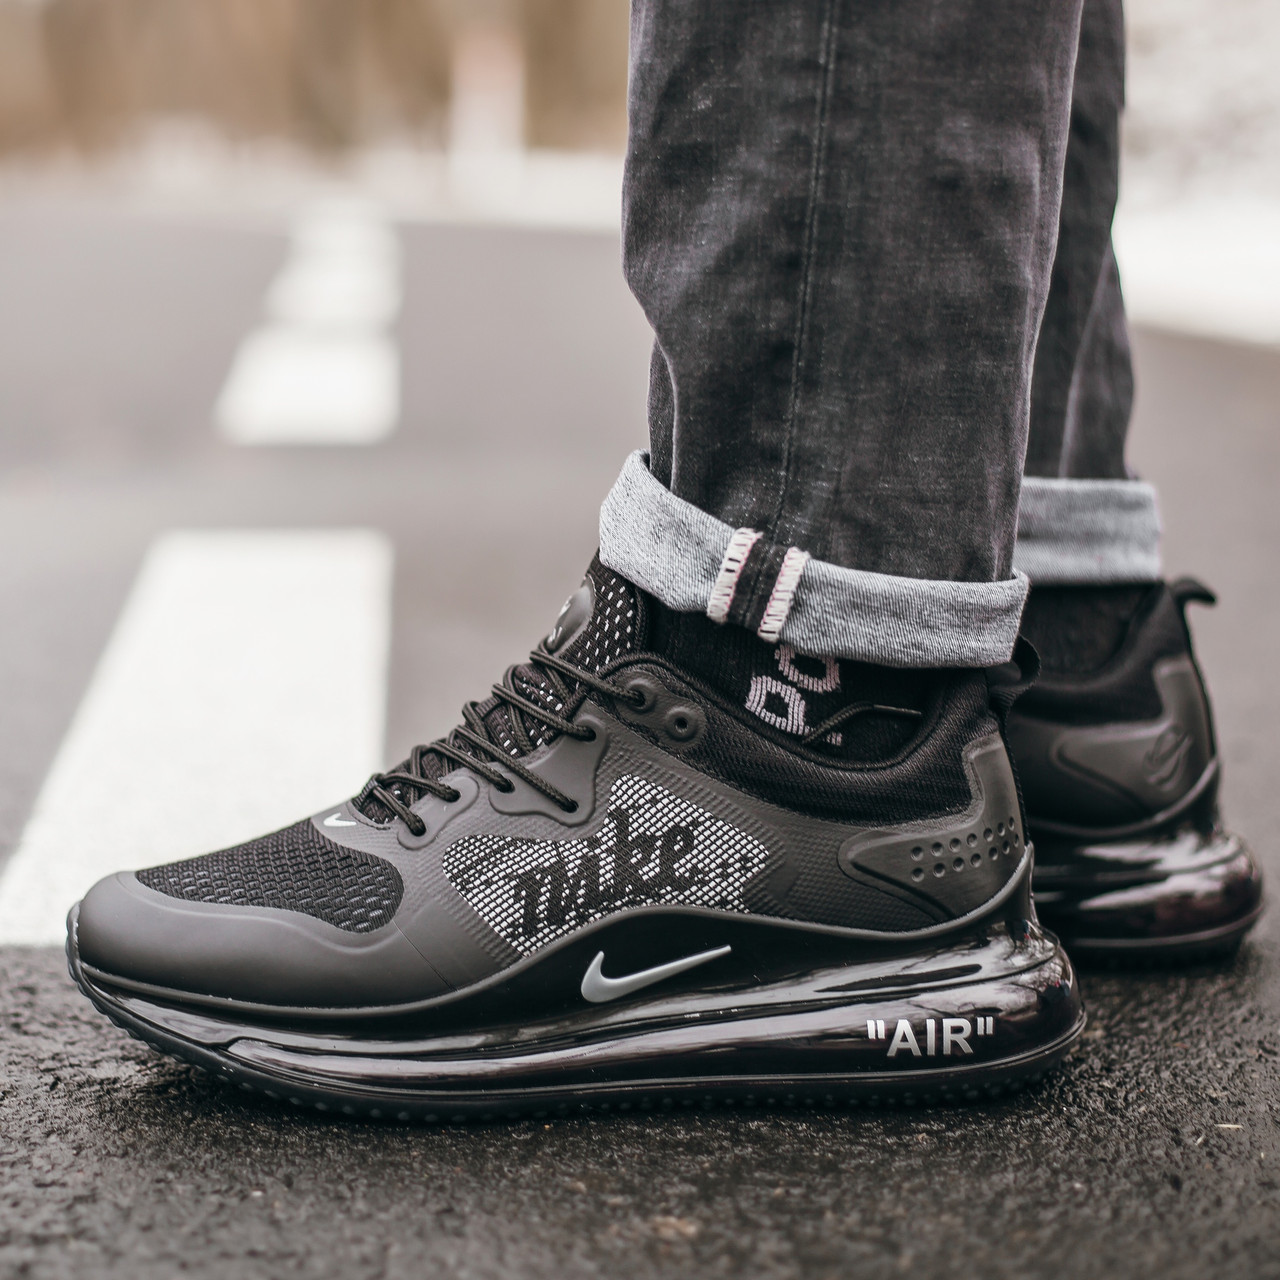 Мужские кроссовки Nike Air Max 720, Реплика